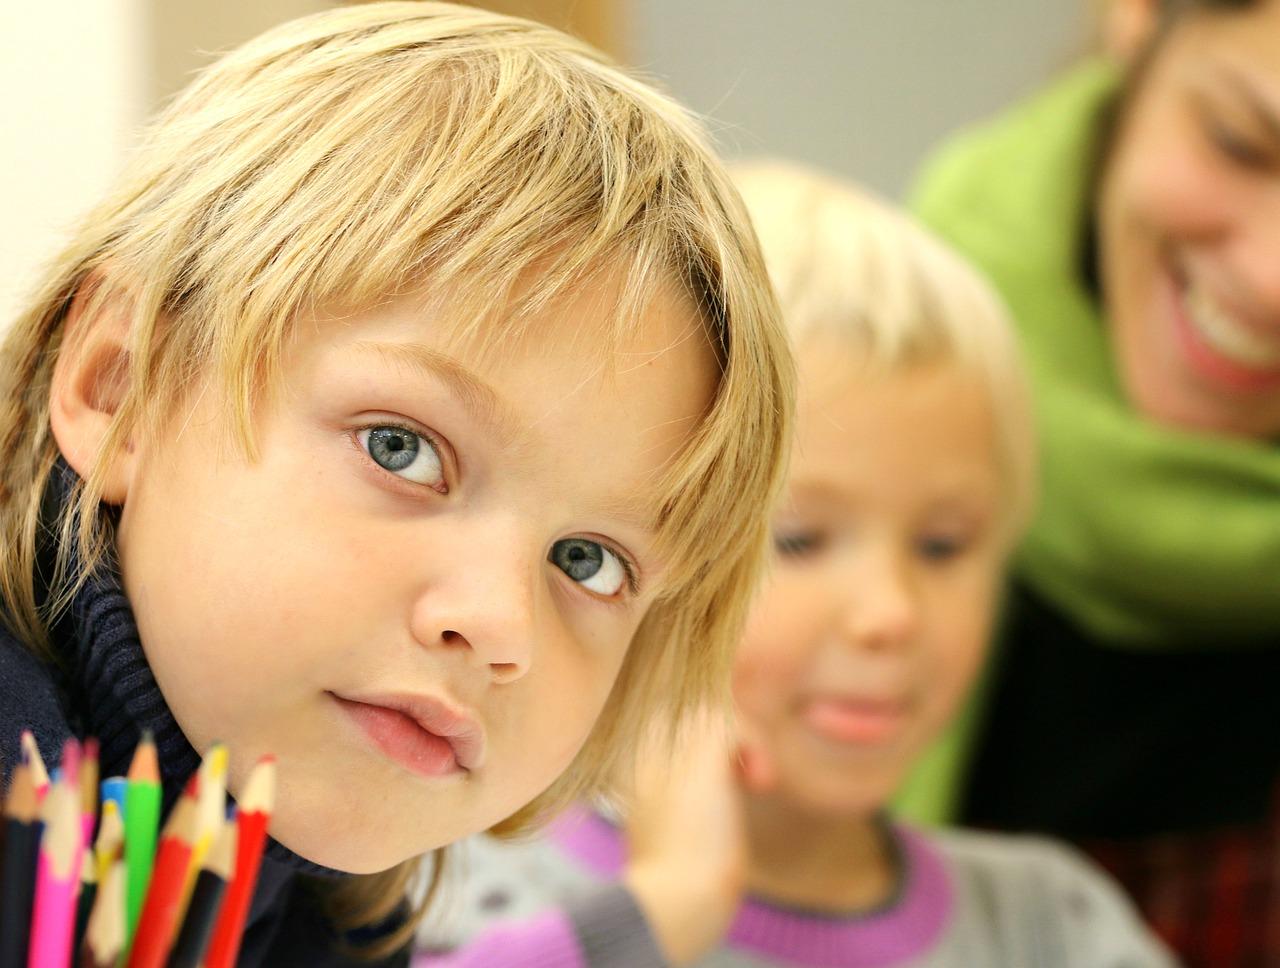 Michigan K-12 Schools Invited to Apply for Innovative Wellness Program